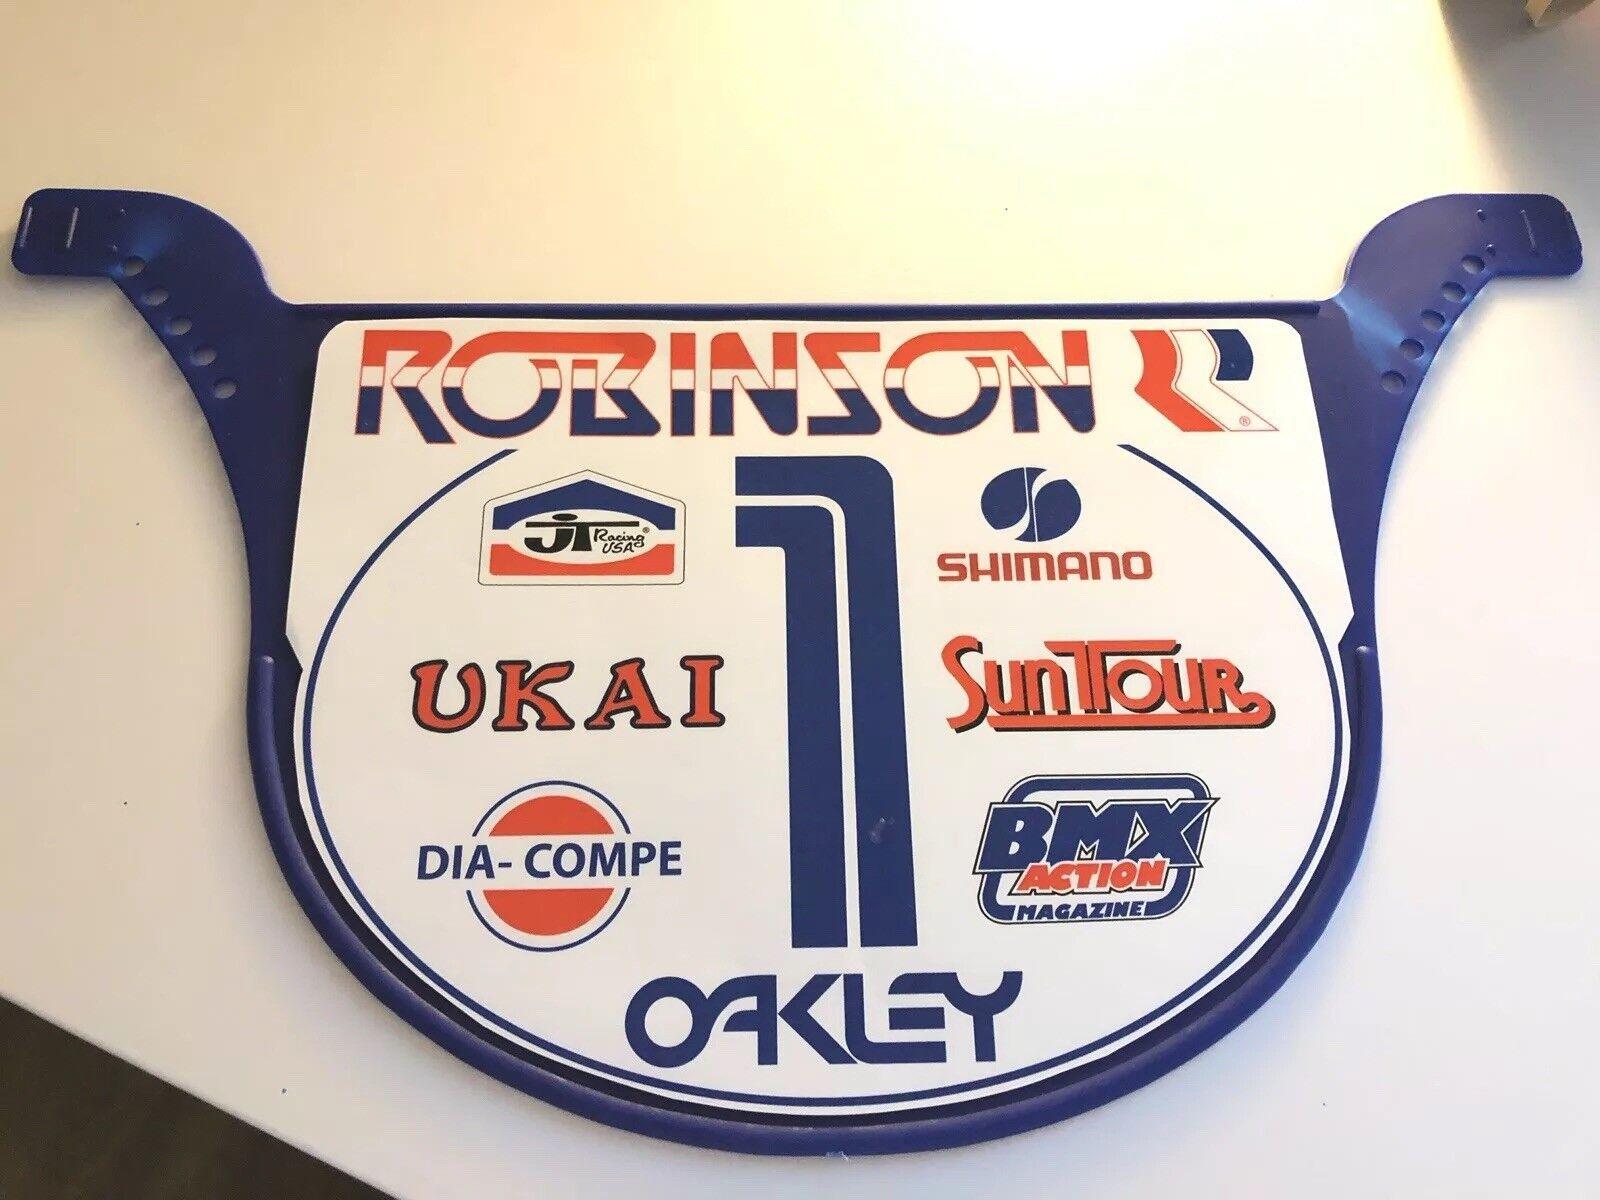 Old School Predo Plate BMX Number plate by NEAL Enterprises - ROBINSON BMX